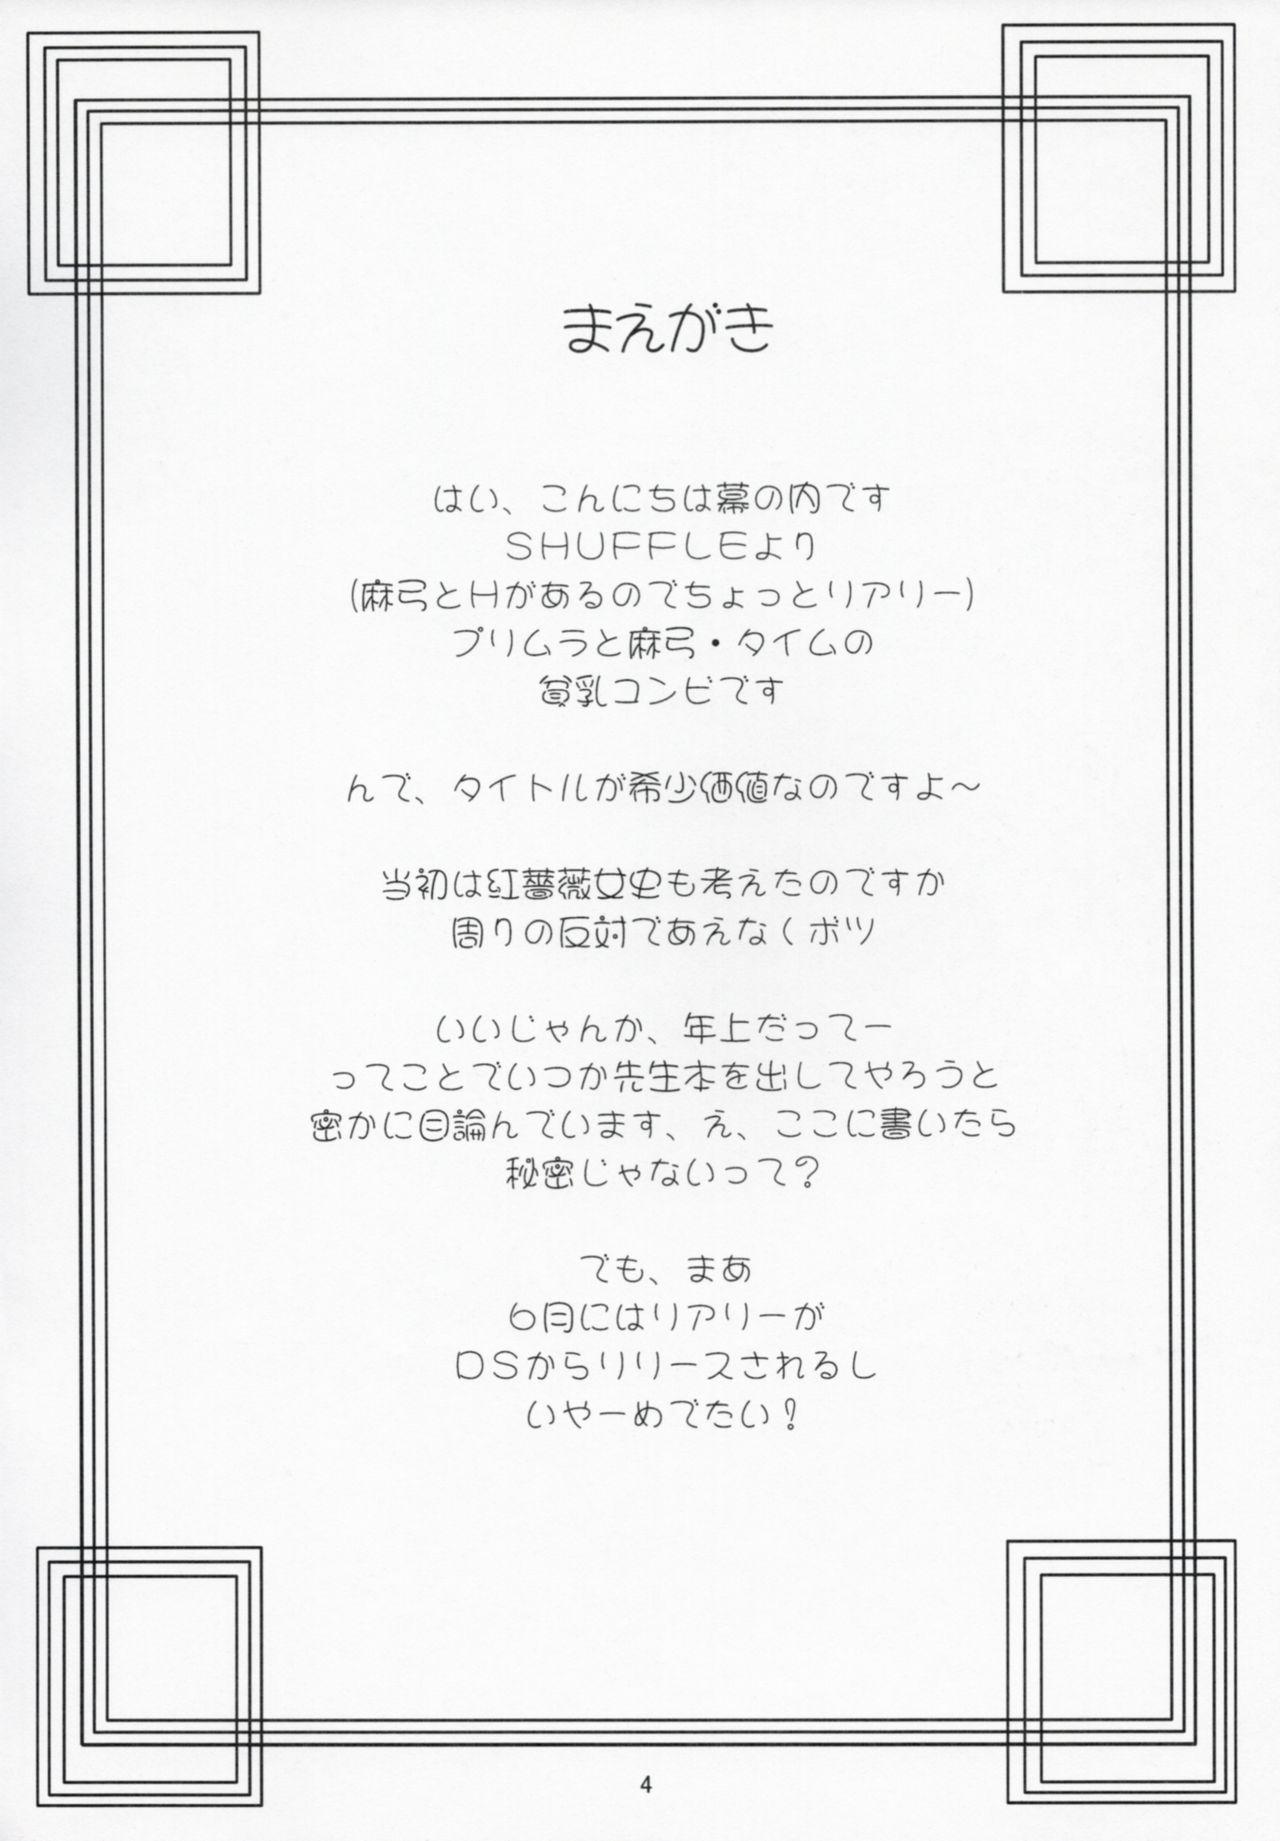 Puri Mayu Kishou Kachida 2